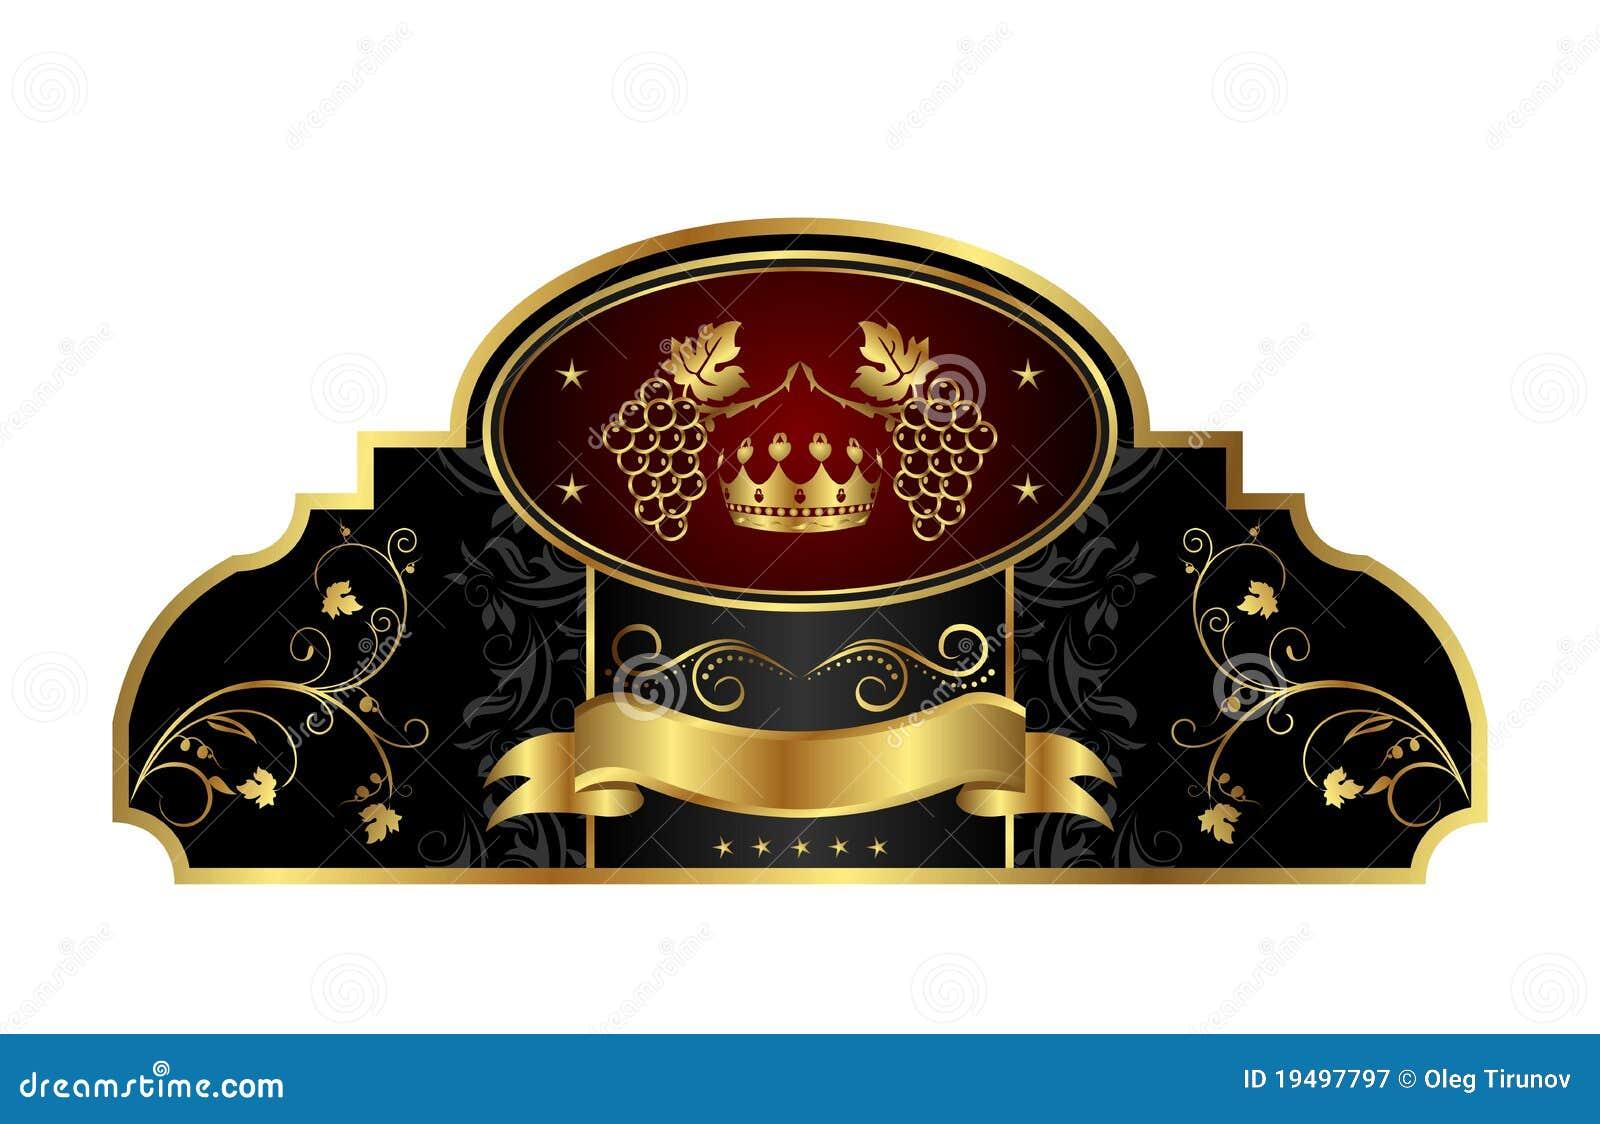 Escritura de la etiqueta decorativa del marco del oro con la vid